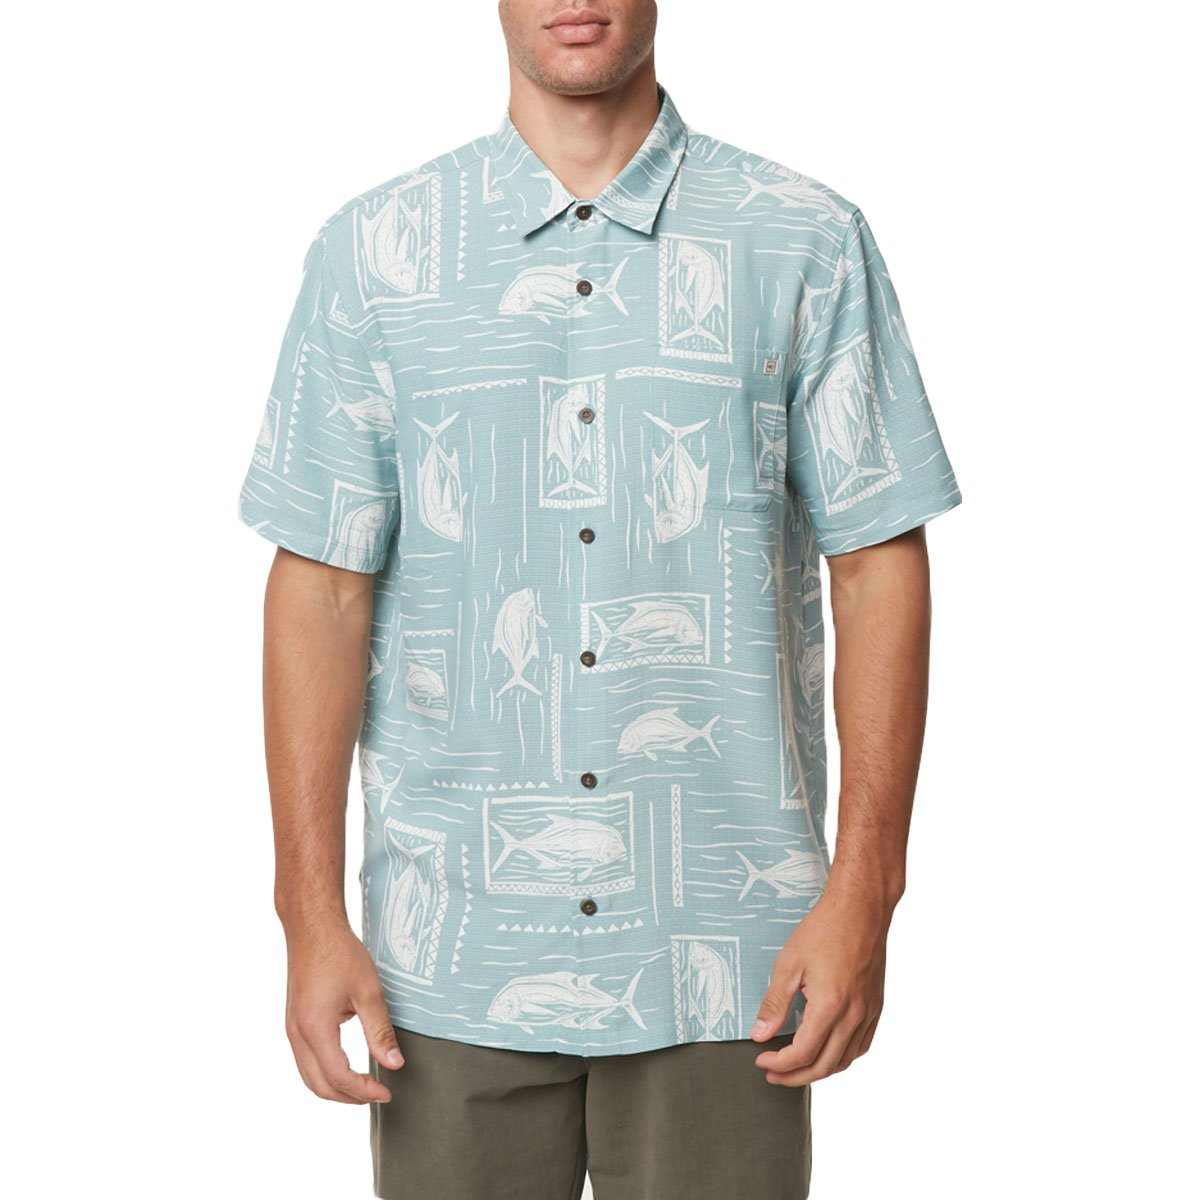 O'Neill Men's Jack Waters Shirts,Medium,Sea Glass